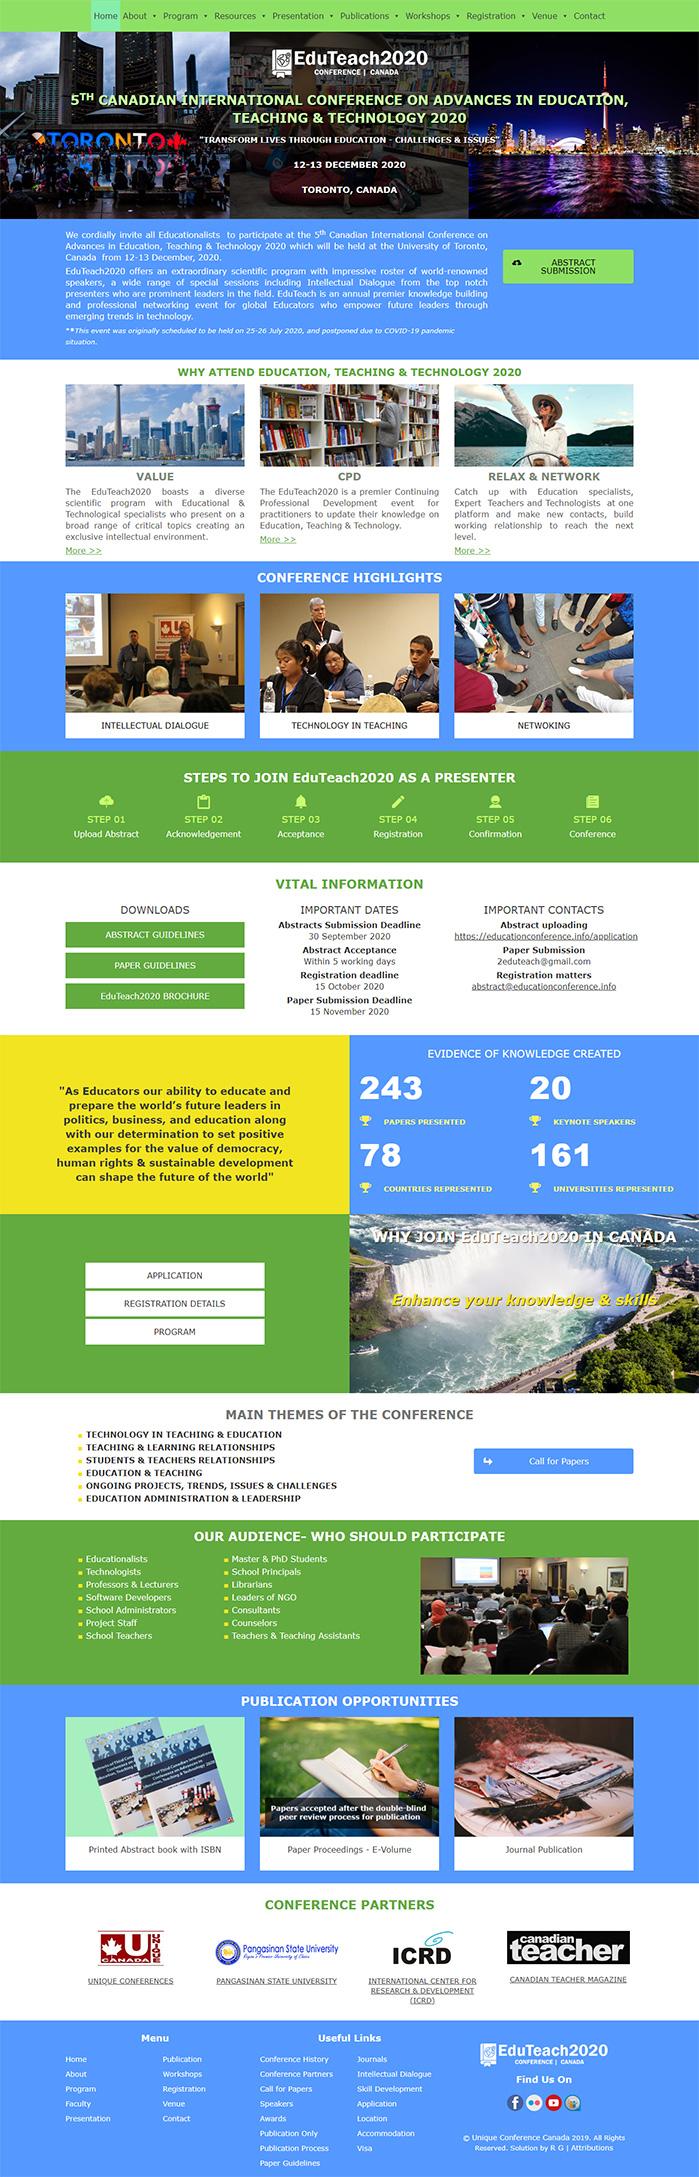 educationconference-info-web-site-design-in-sri-lanka